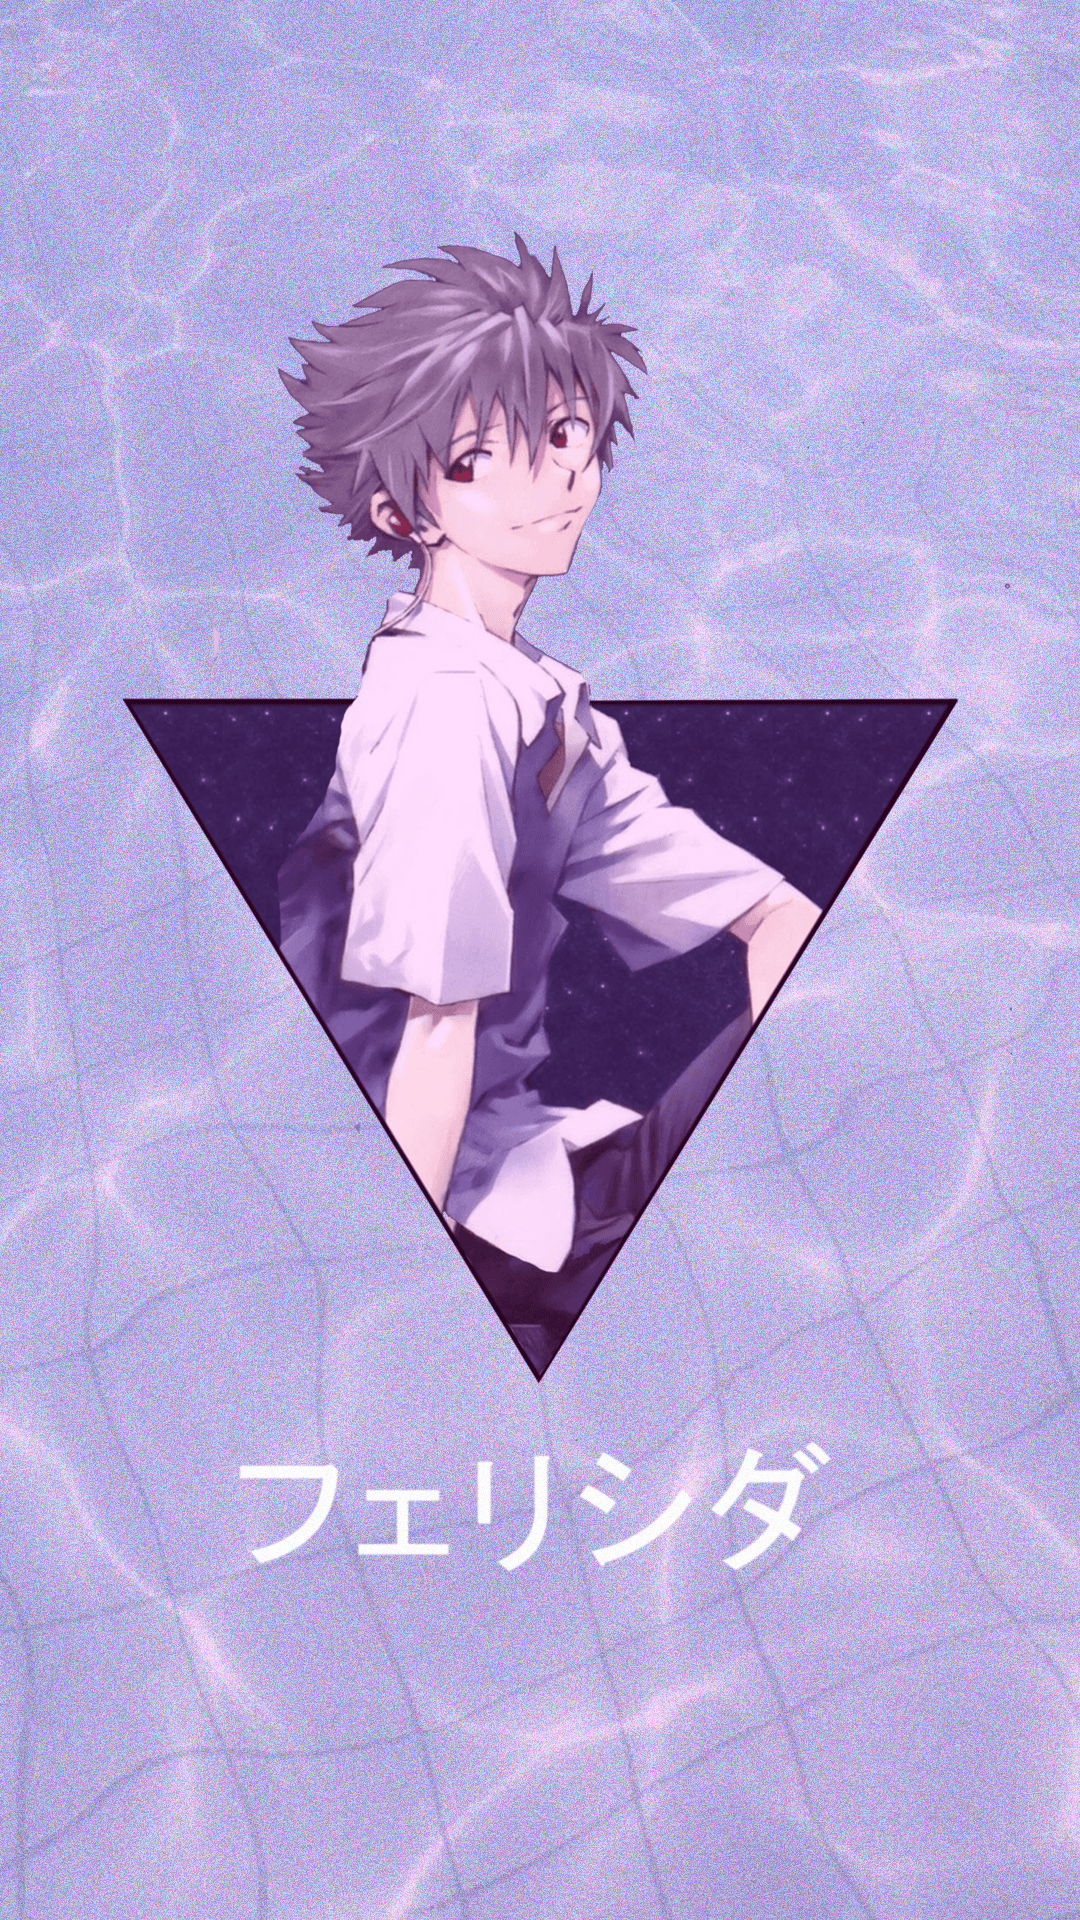 aesthetic boy wallpapers